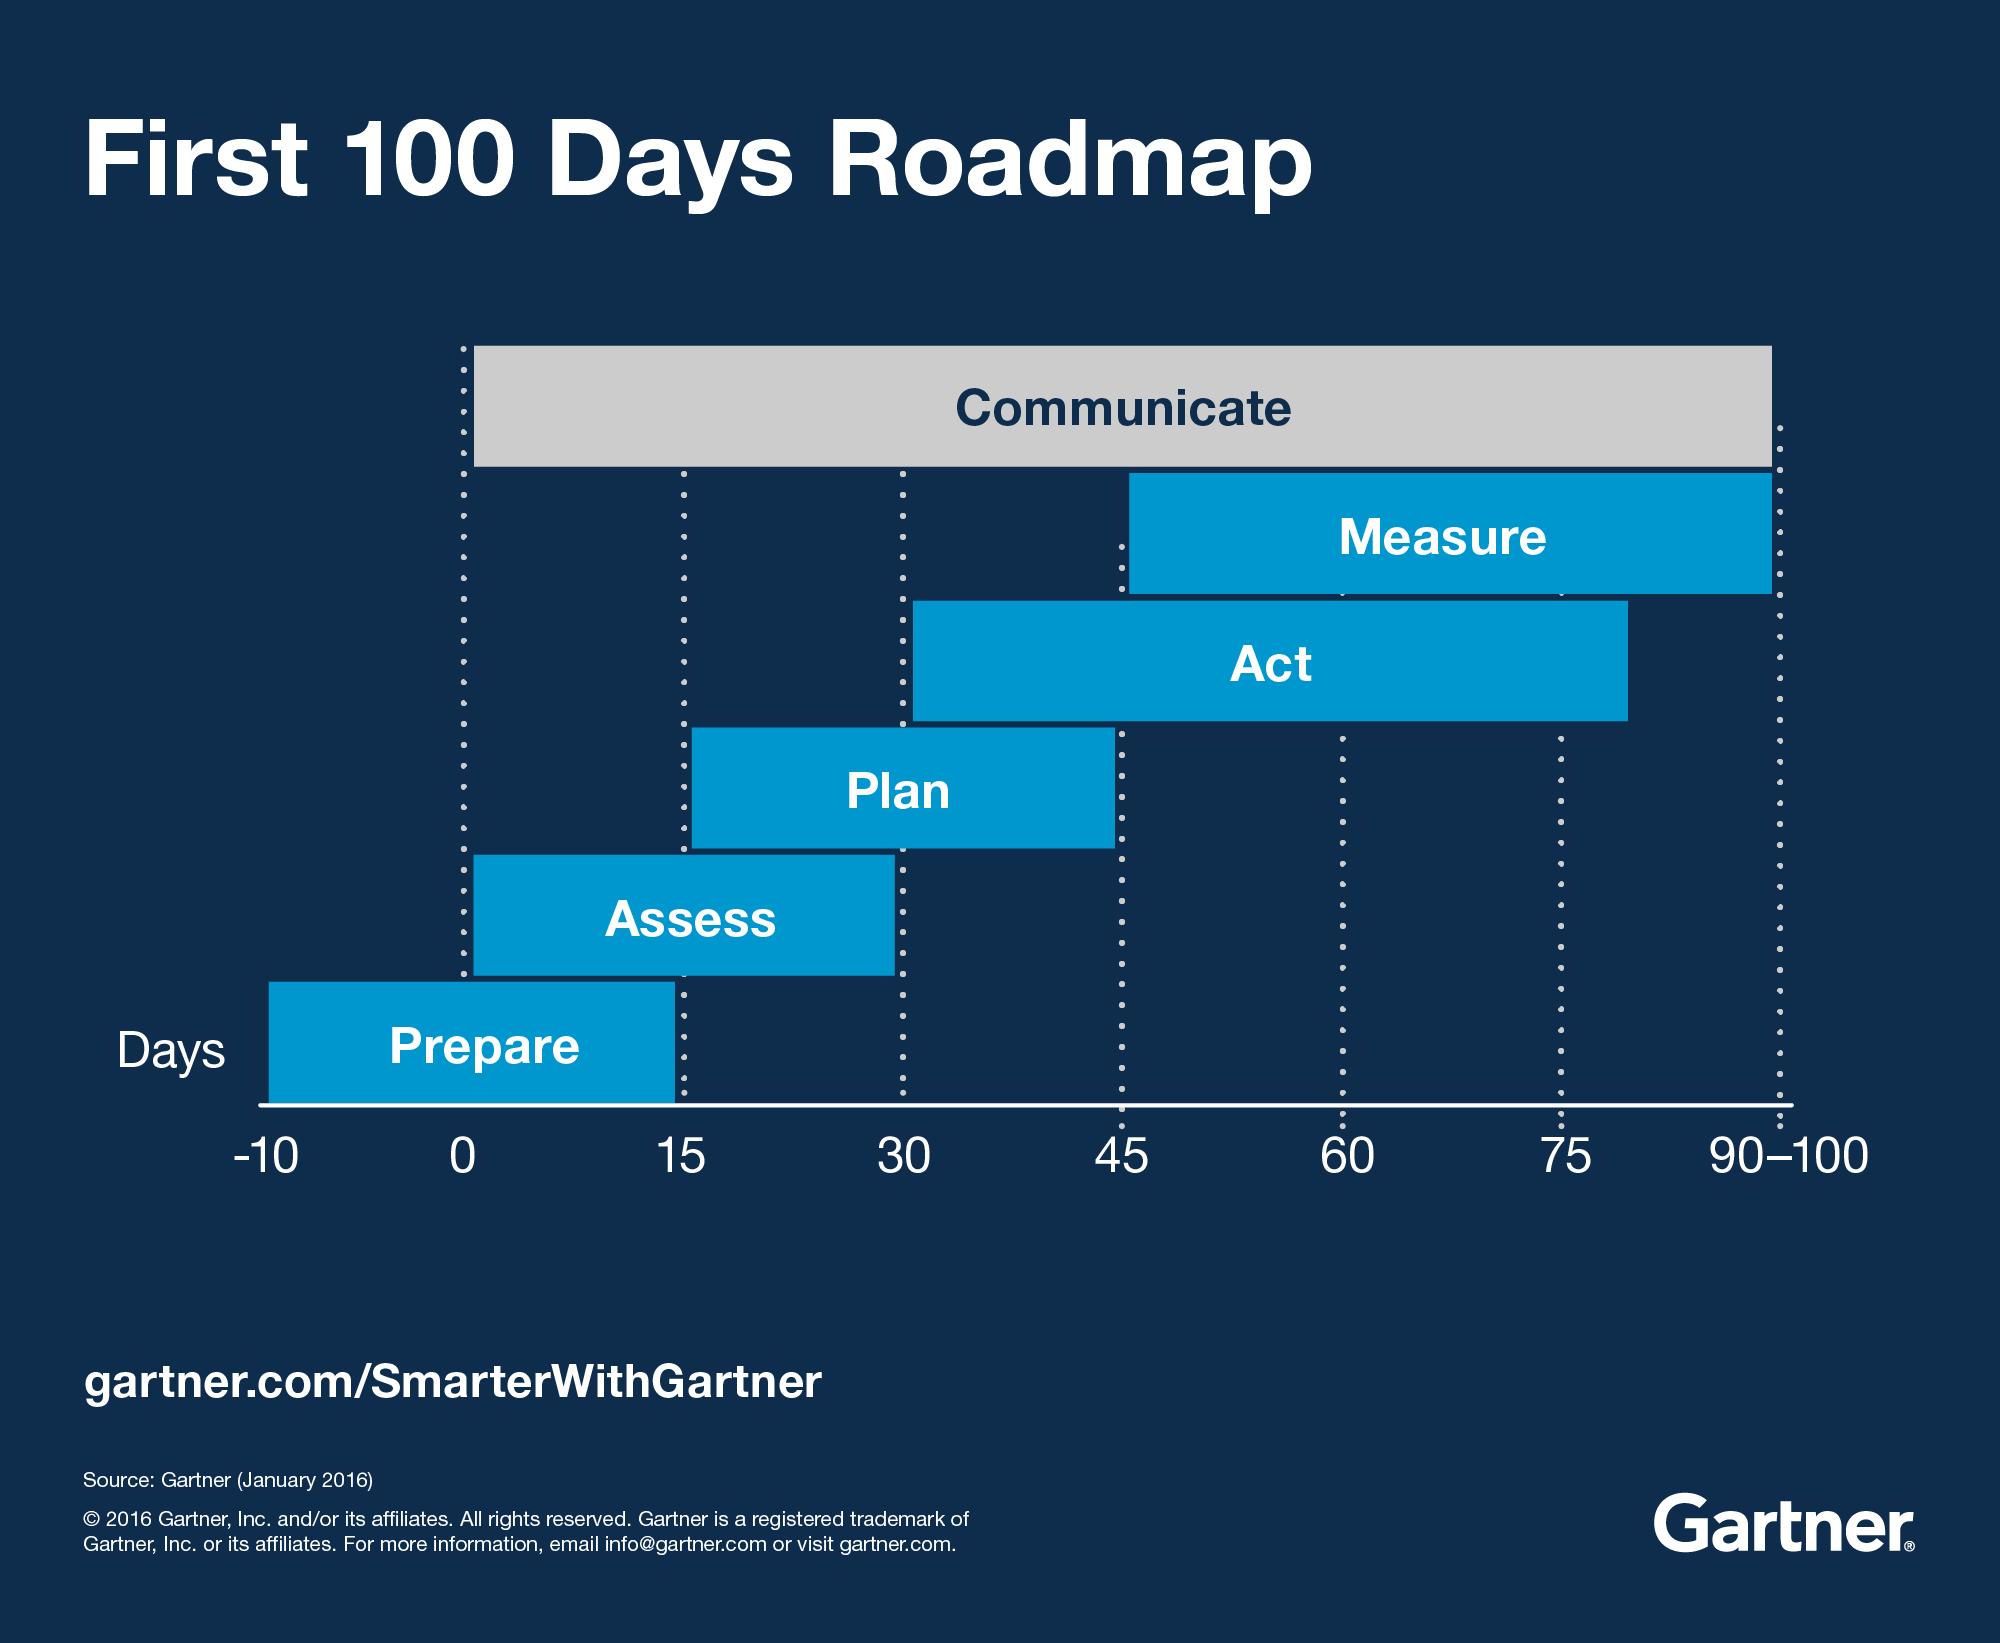 First 100 Days Roadmap